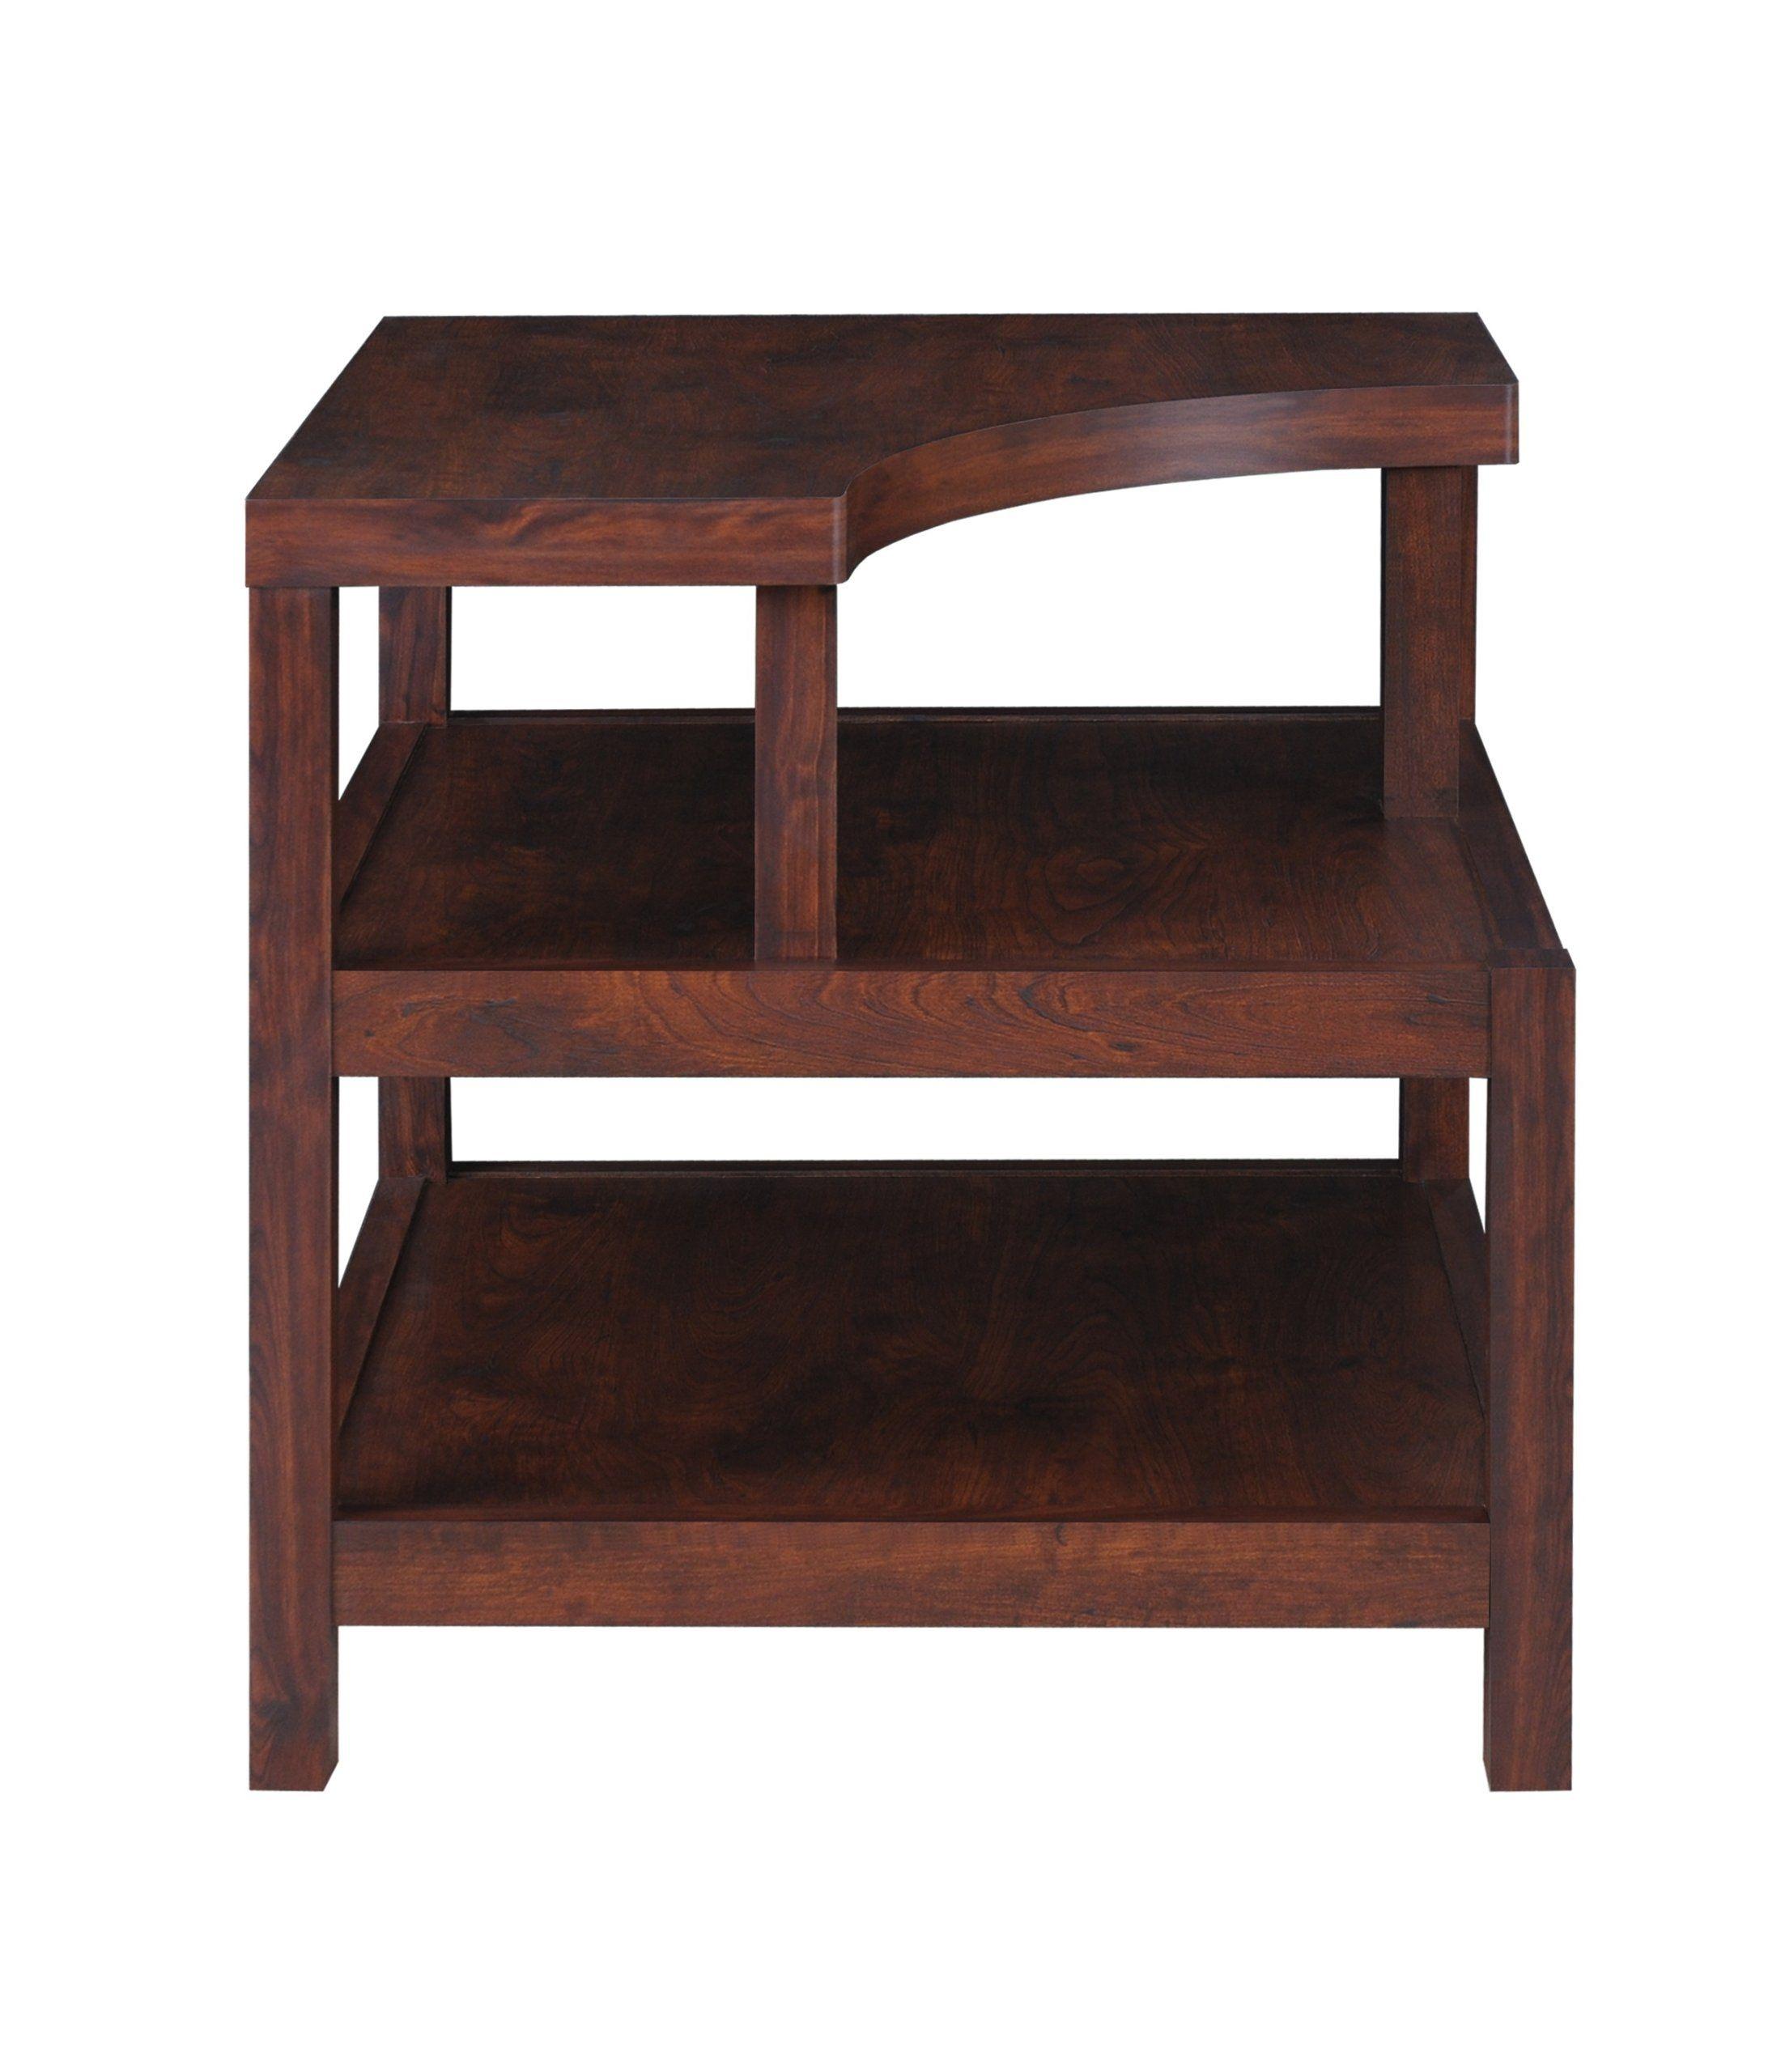 Furniture Of America Torsae 3 Shelf End Table, Vintage Walnut